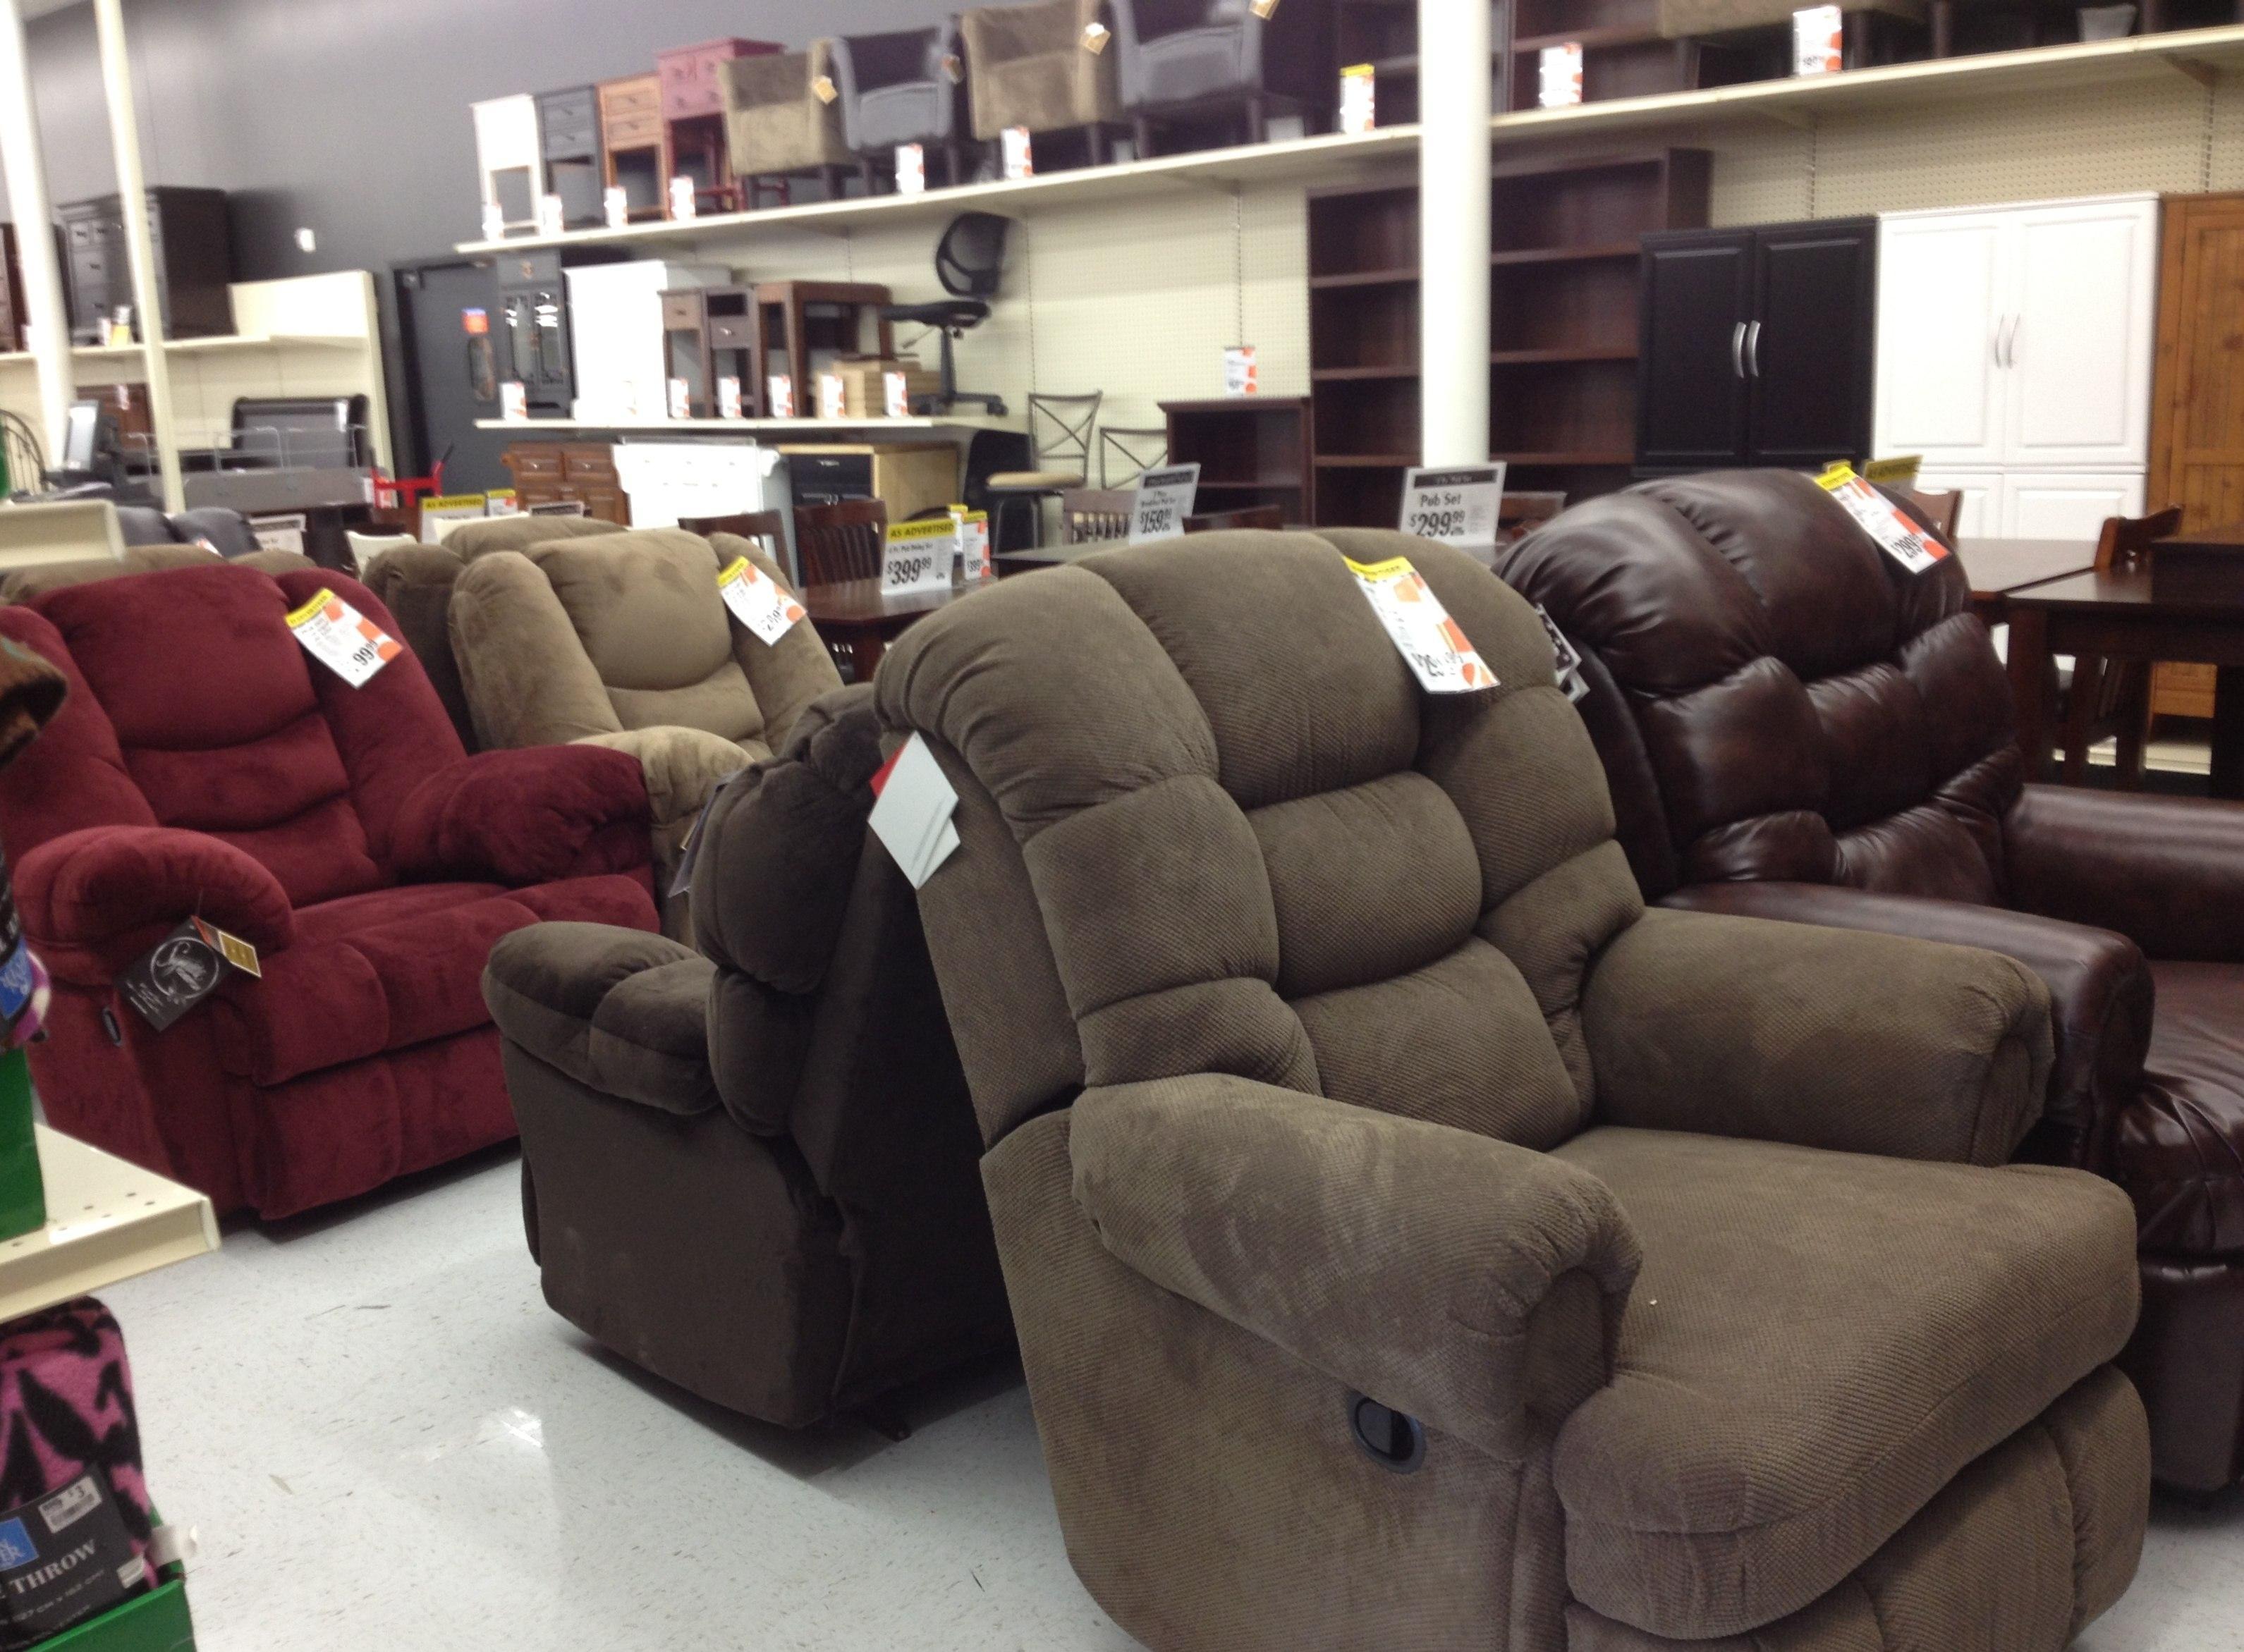 Sofa Big Lots With Big Lots Sofa (View 12 of 20)